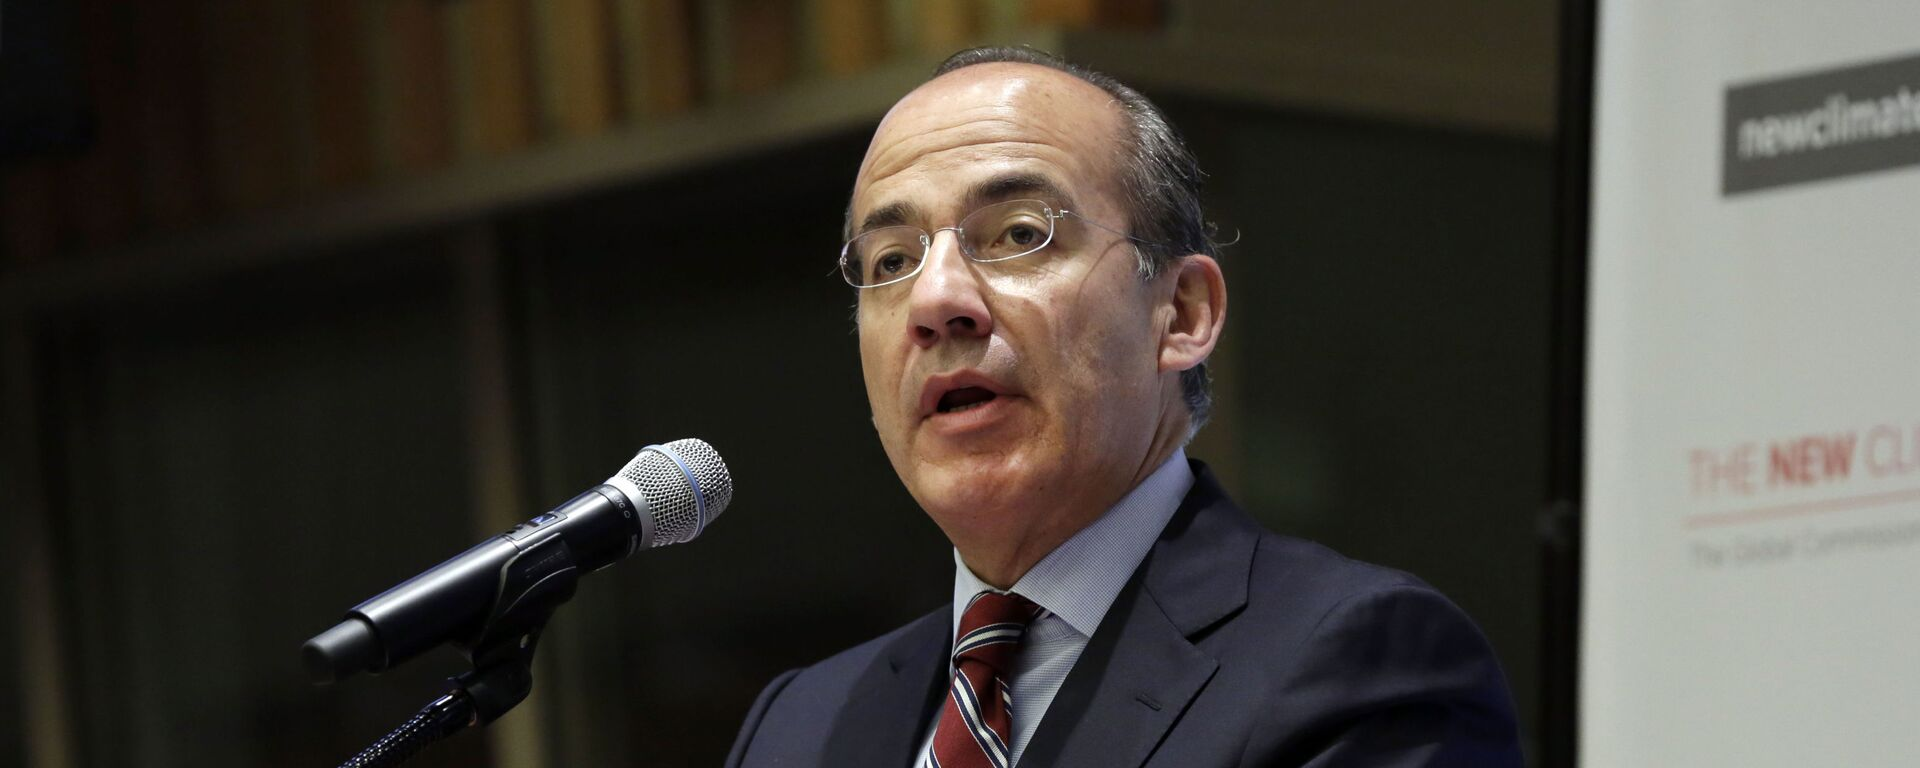 El expresidente de México Felipe Calderón - Sputnik Mundo, 1920, 20.05.2021